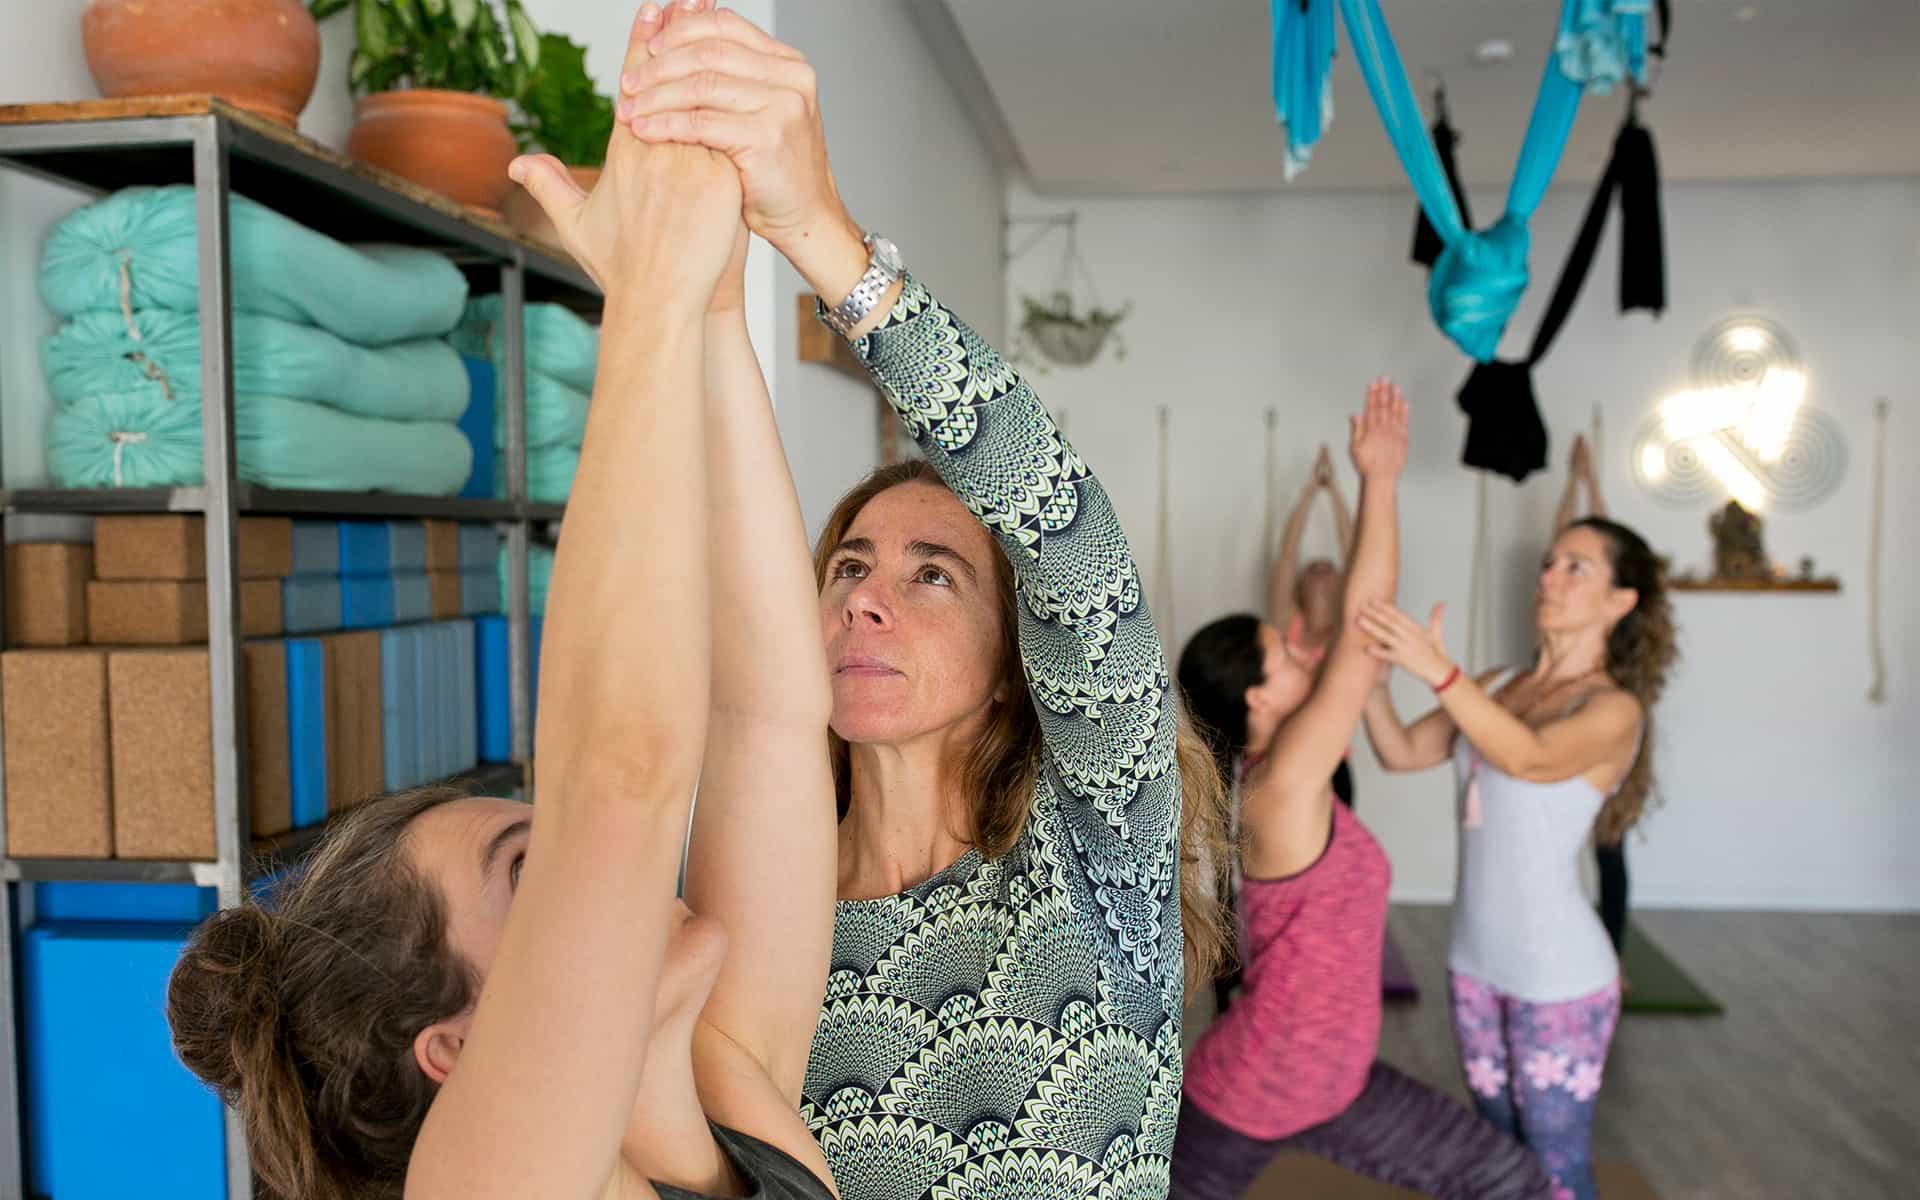 surf camp ericeira - Activities - Yoga Classes